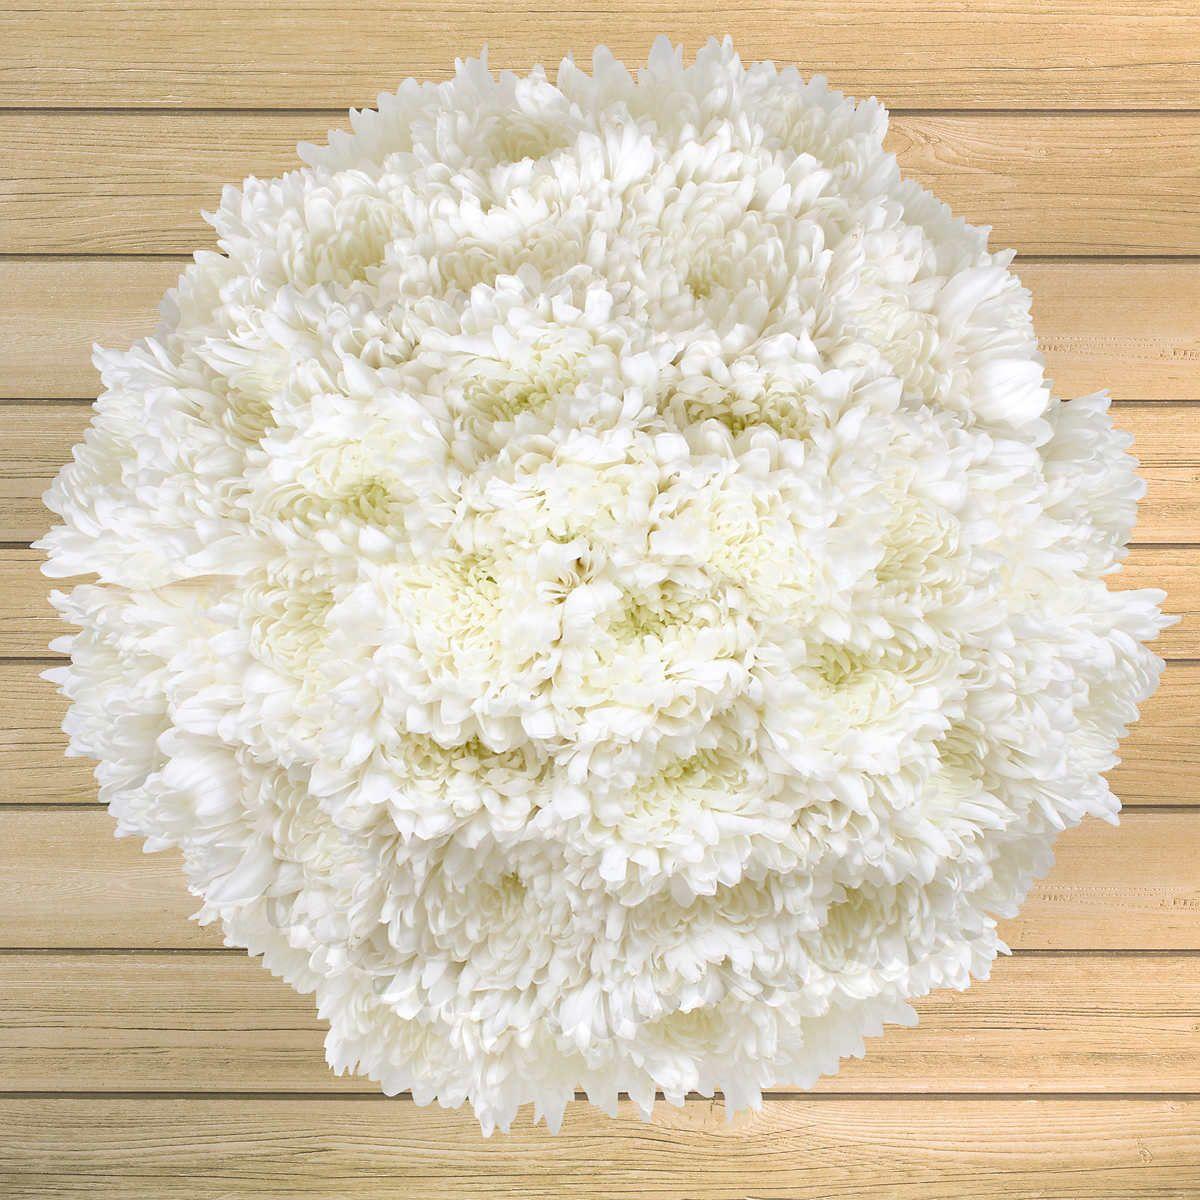 80stem Disbud Mums Costco flowers, Bulk roses, Flower